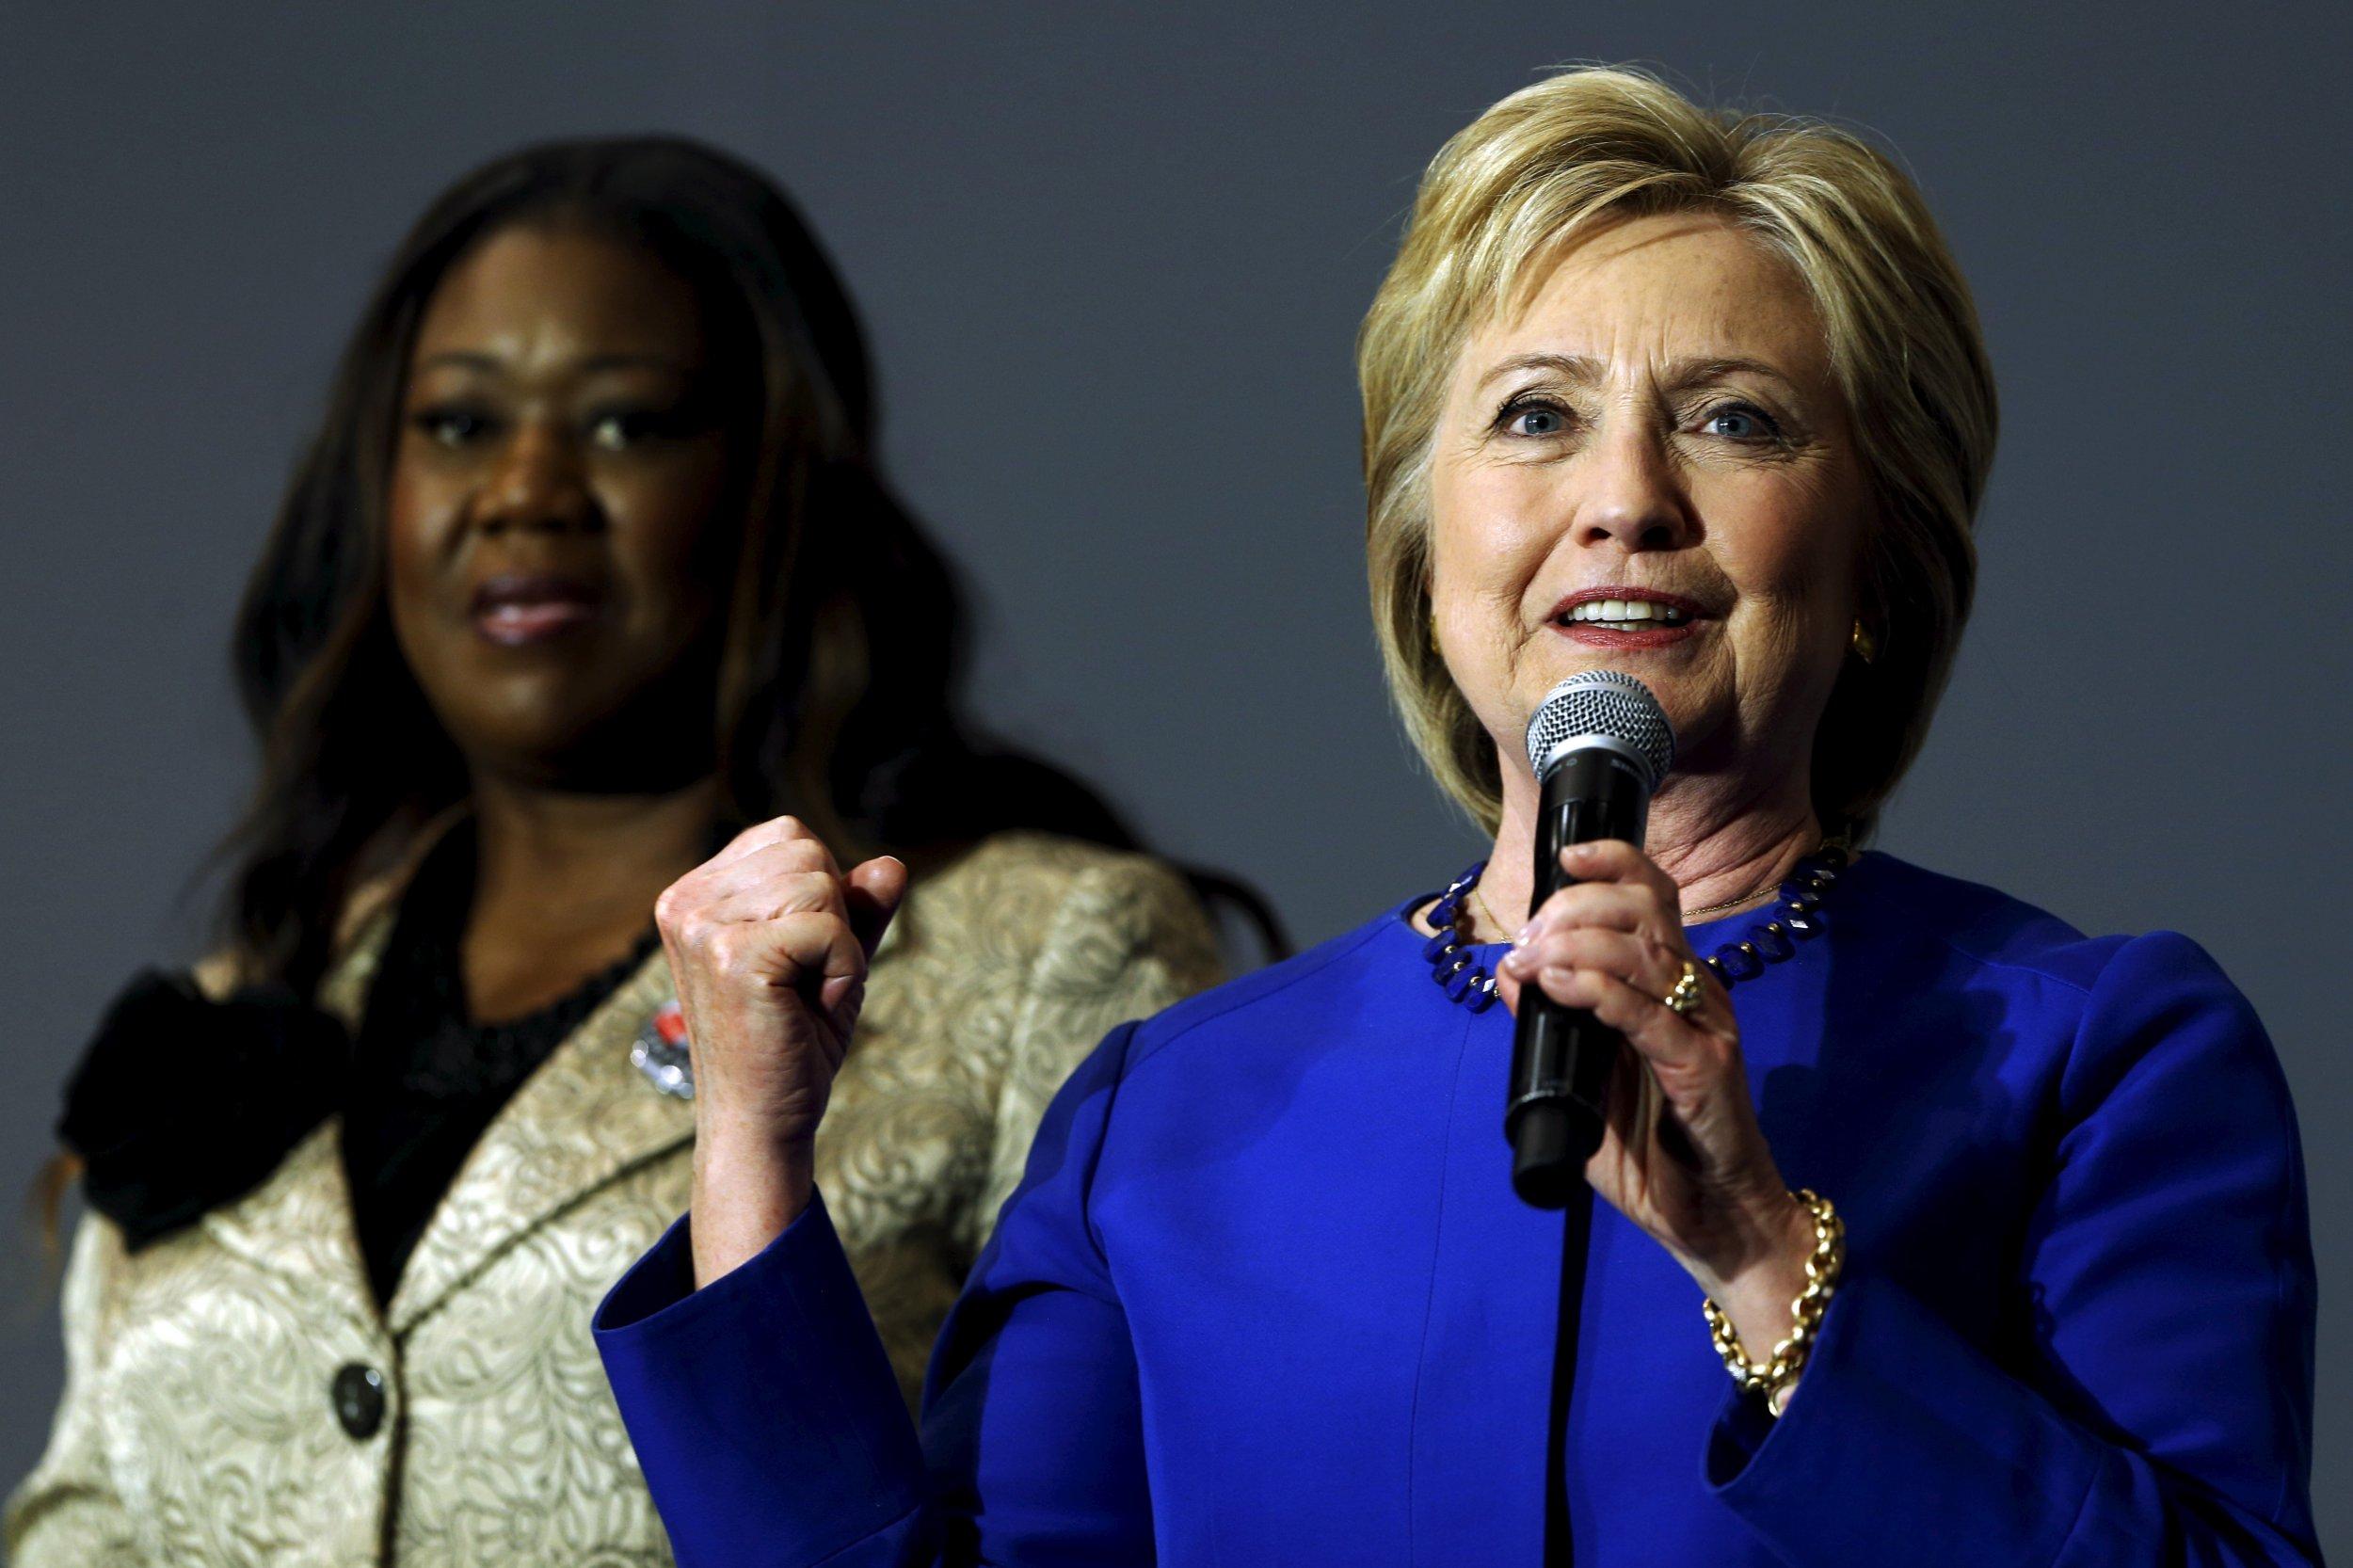 0603_Everytown_endorses_Hillary_Clinton_01